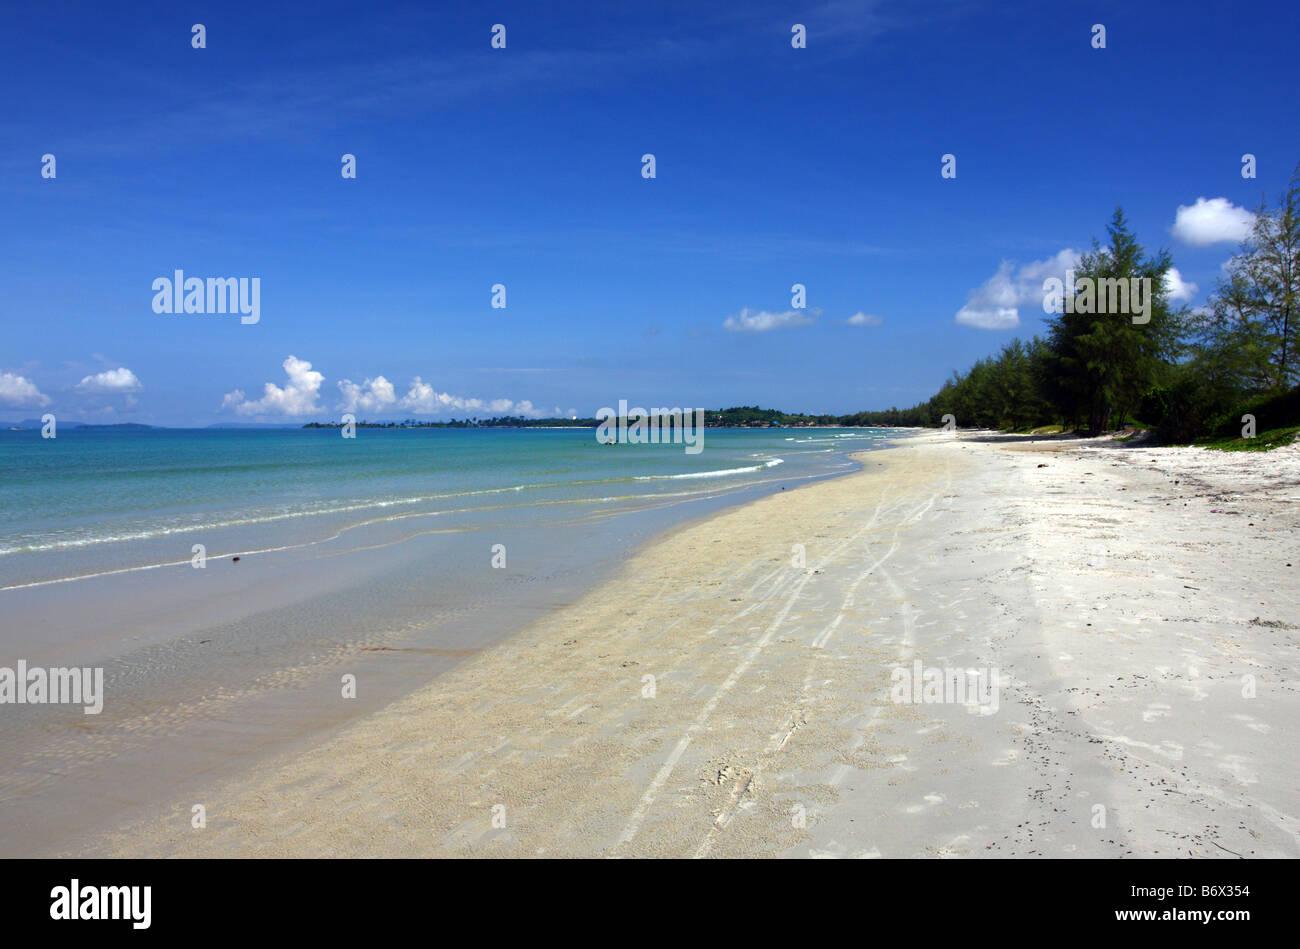 Serendipity beach, Sihanoukville Cambodia - Stock Image